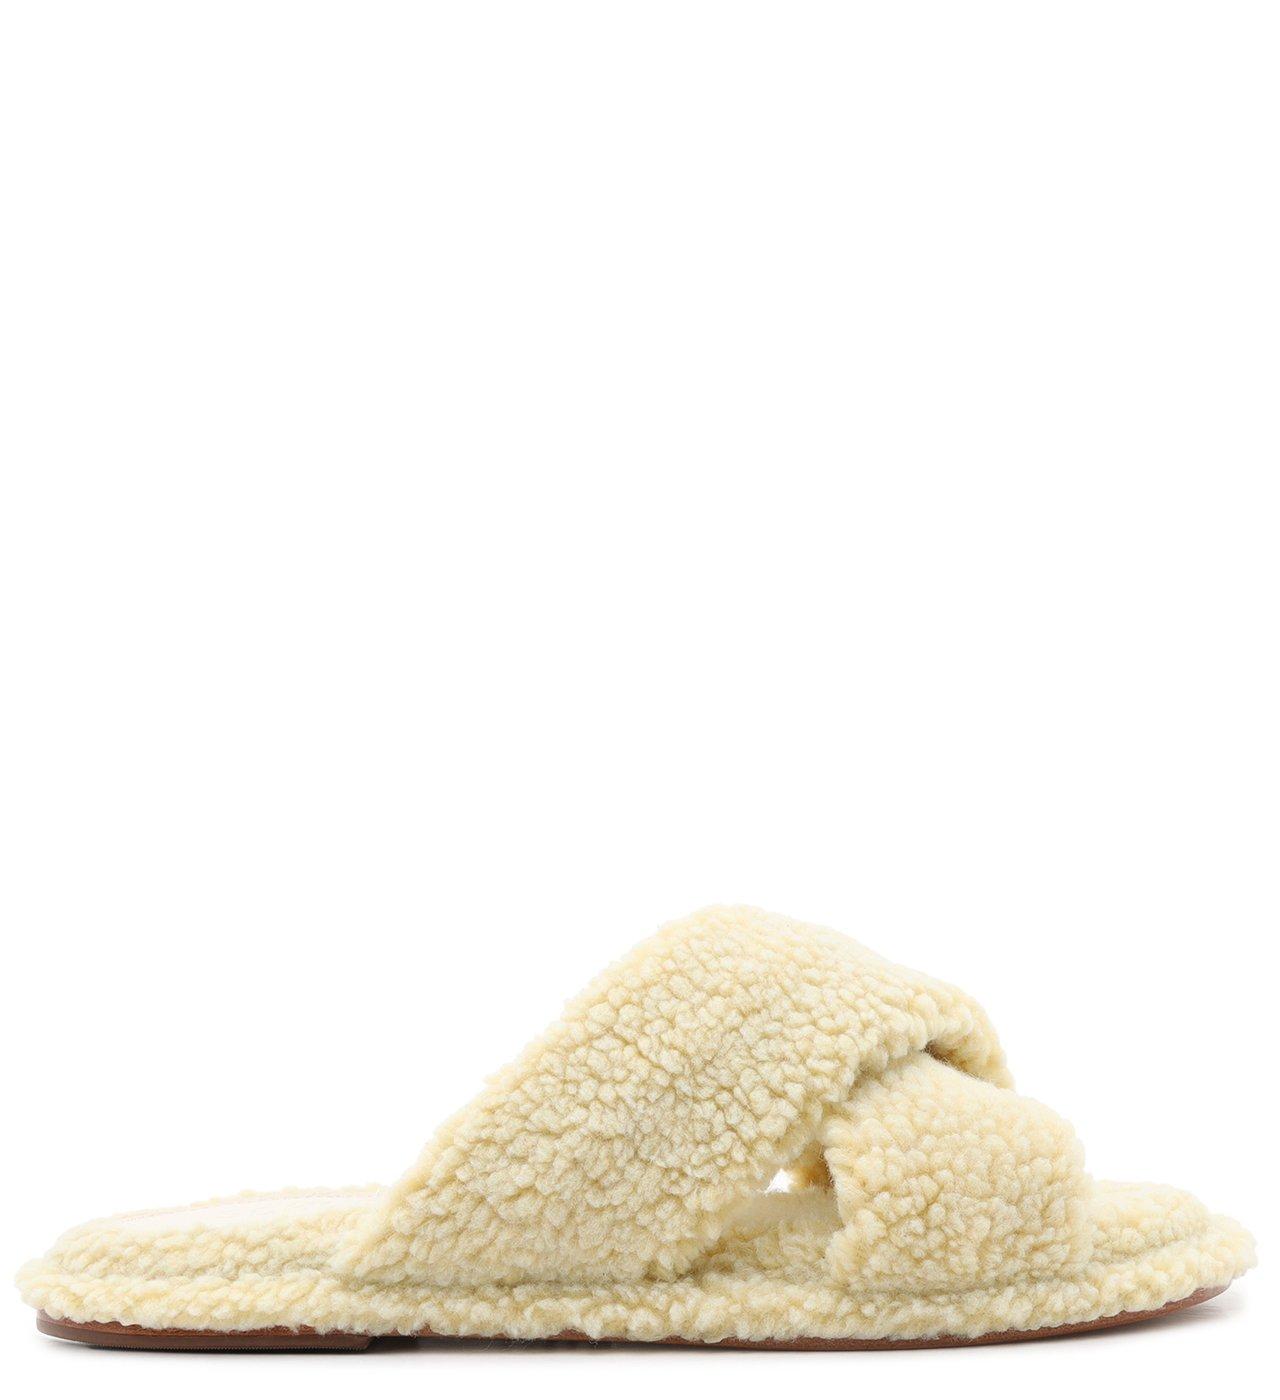 Homewear Flat Slide Lucy Alpaca Areia | Schutz